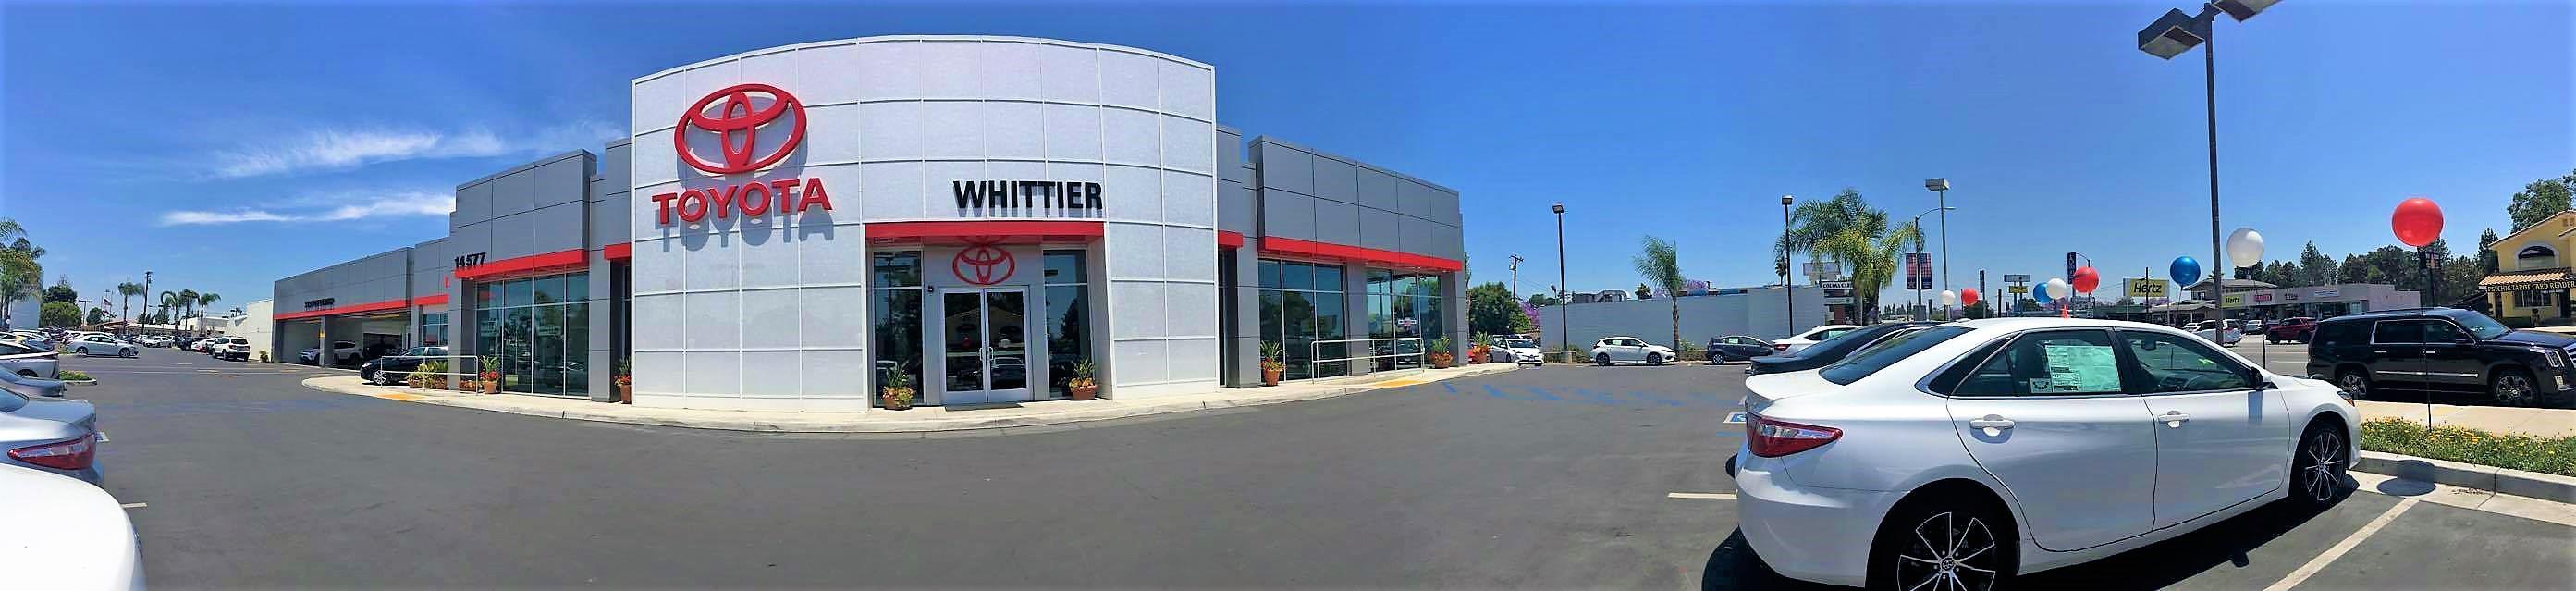 Toyota of Whittier image 6